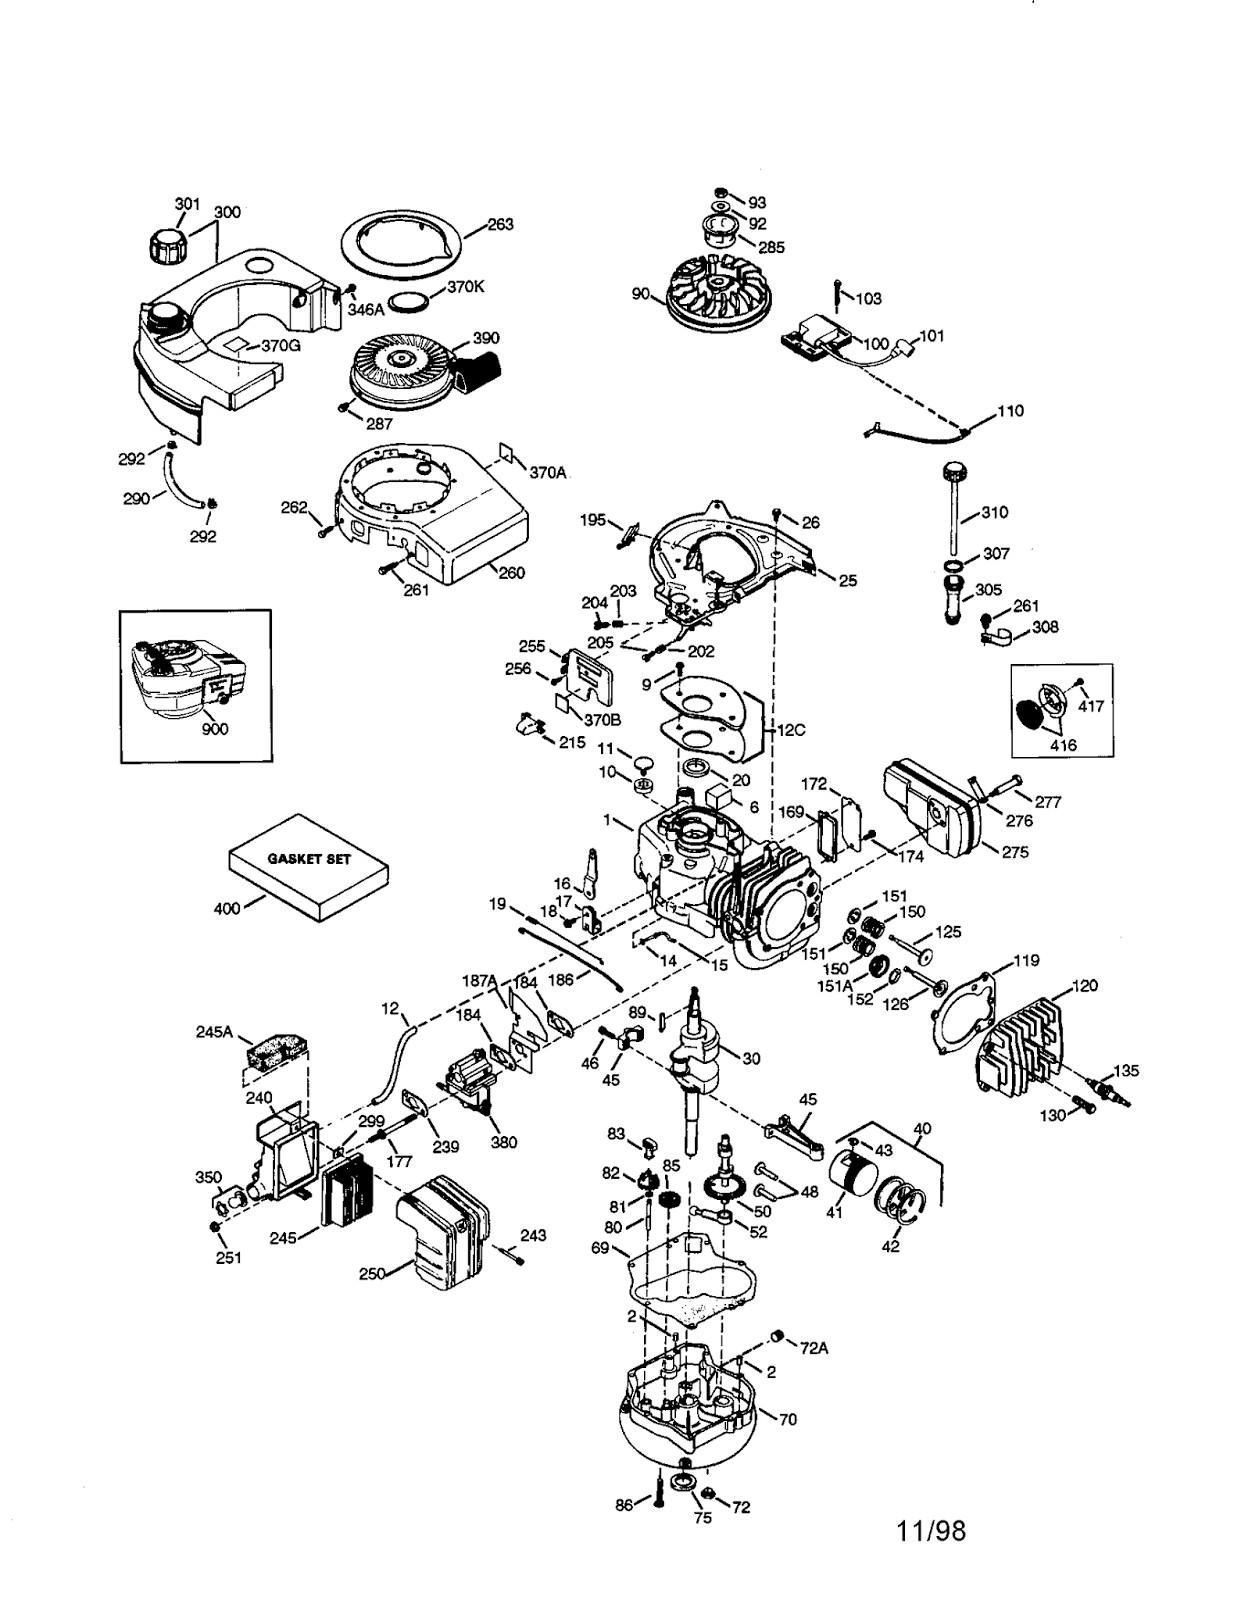 hight resolution of honda gx390 parts diagram free service repair manual tecumseh engine parts diagram of honda gx390 parts